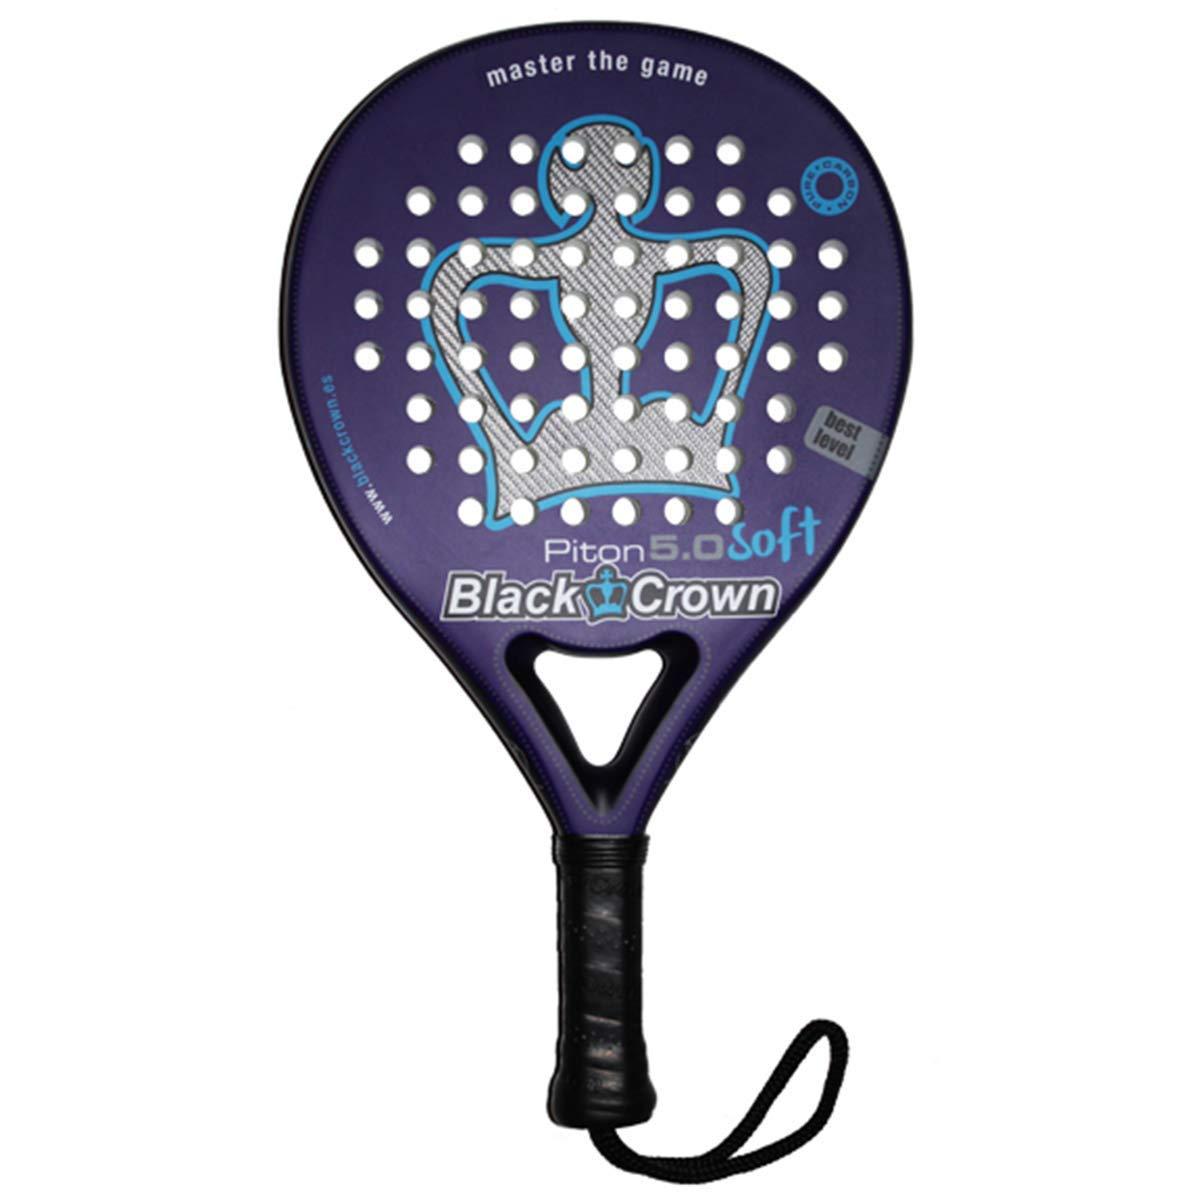 Black Crown Piton 5.0, Adultos Unisex, Multicolor, Talla Unica ...